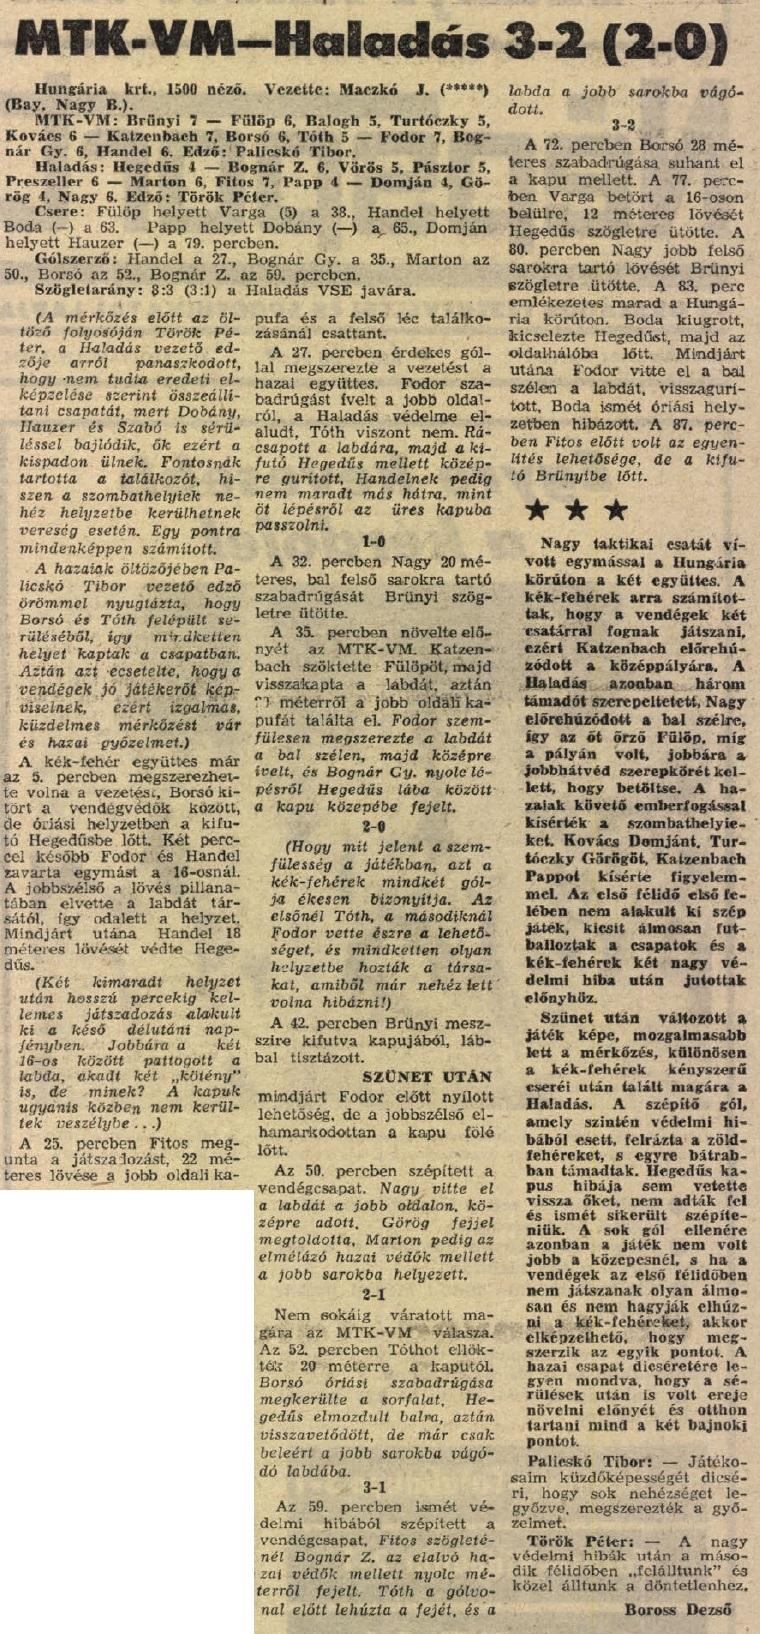 idokapszula_nb_i_1983_84_29_fordulo_mtk_vm_haladas.jpg